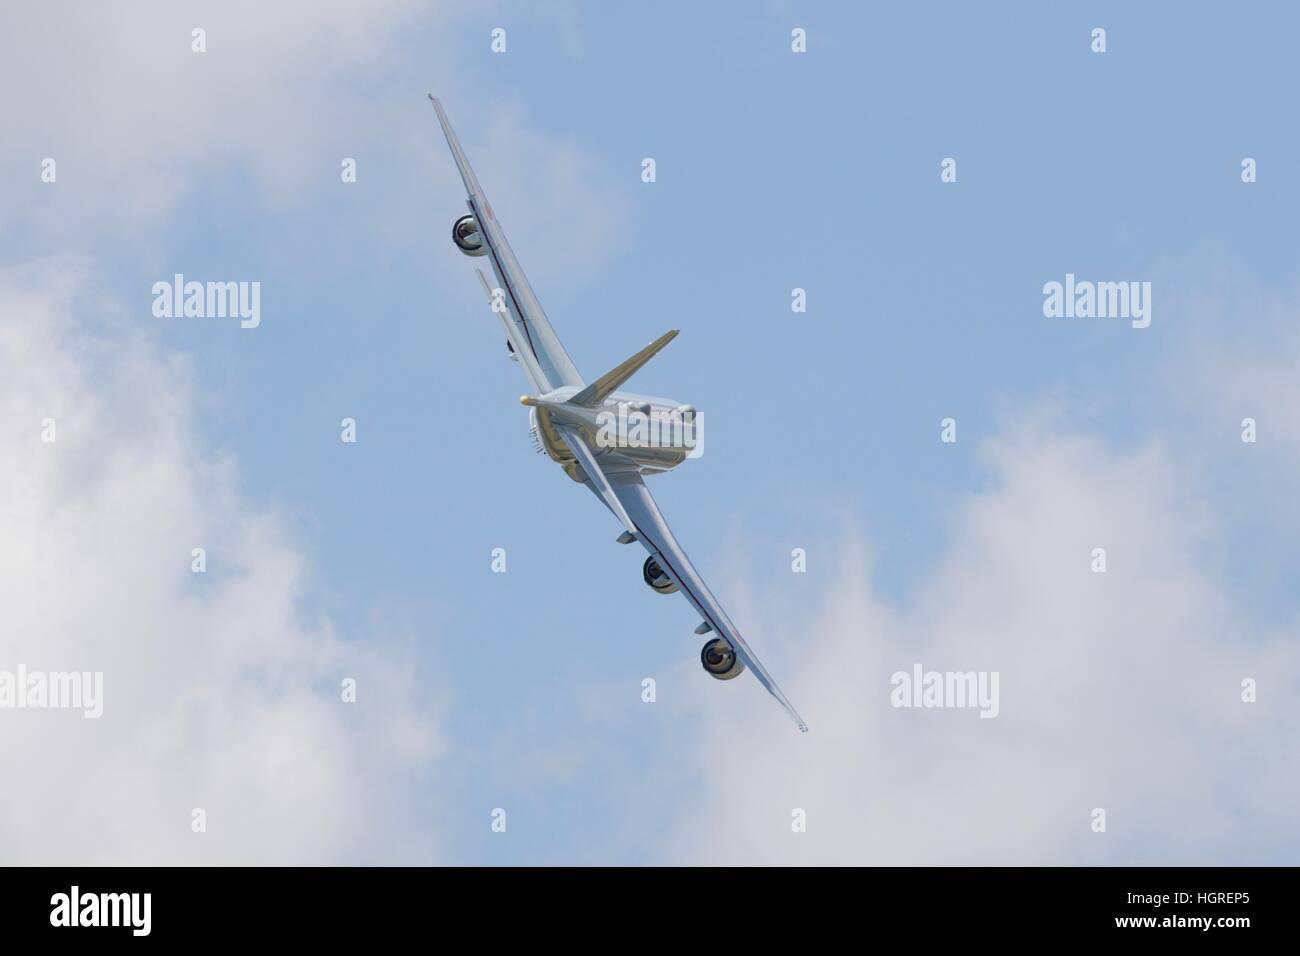 Kawasaki P-1 maritime patrol aircraft - Stock Image